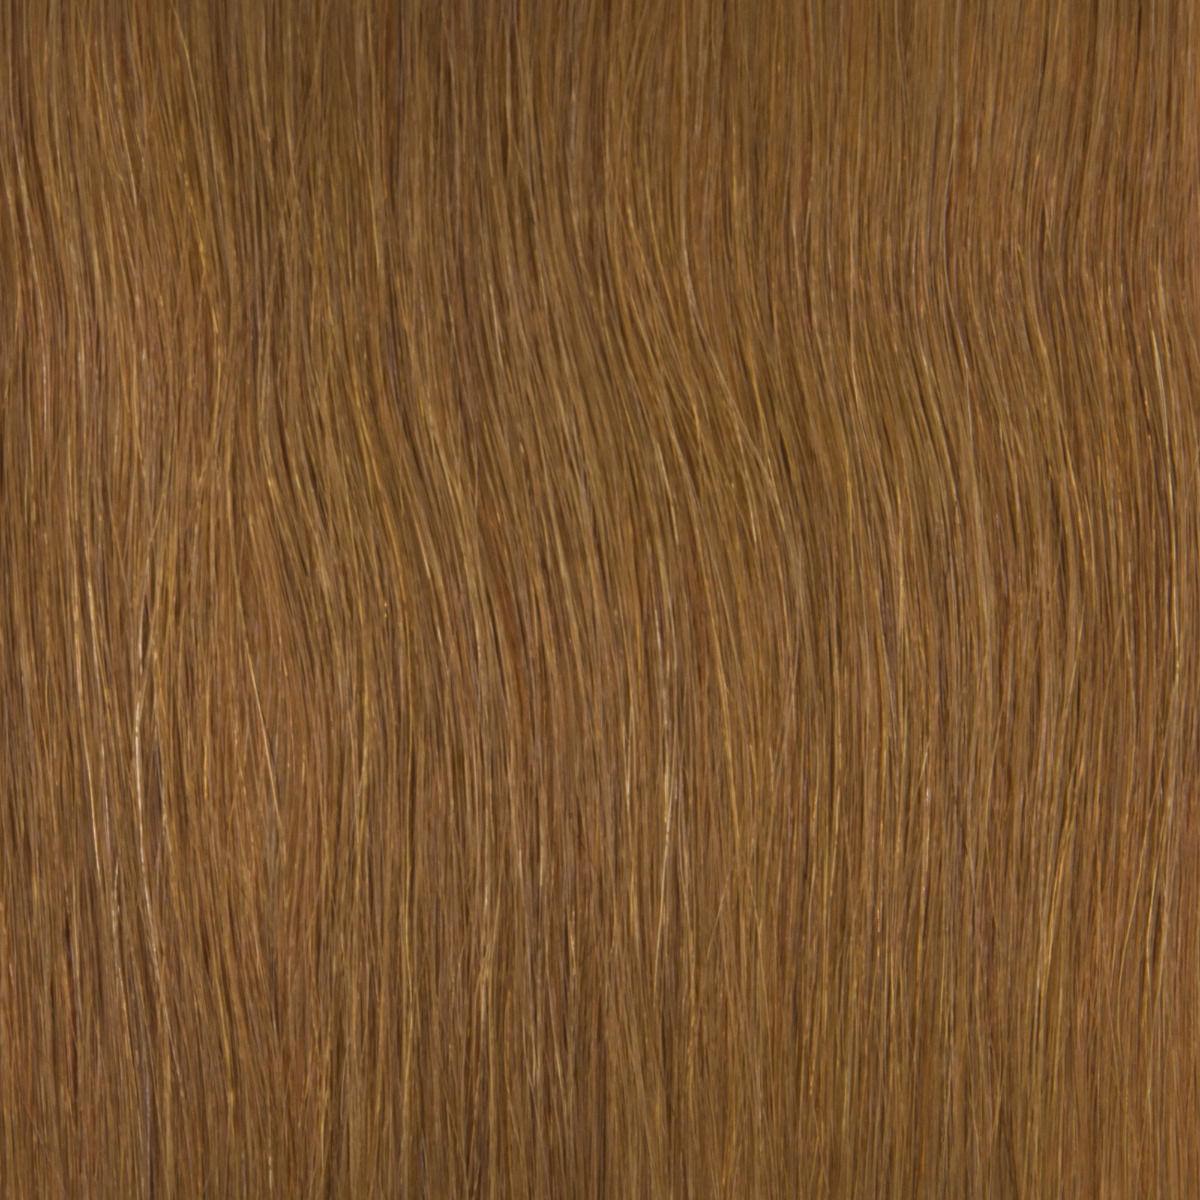 Afbeelding van Balmain Microring Extensions - natural straight - 40cm - #9G